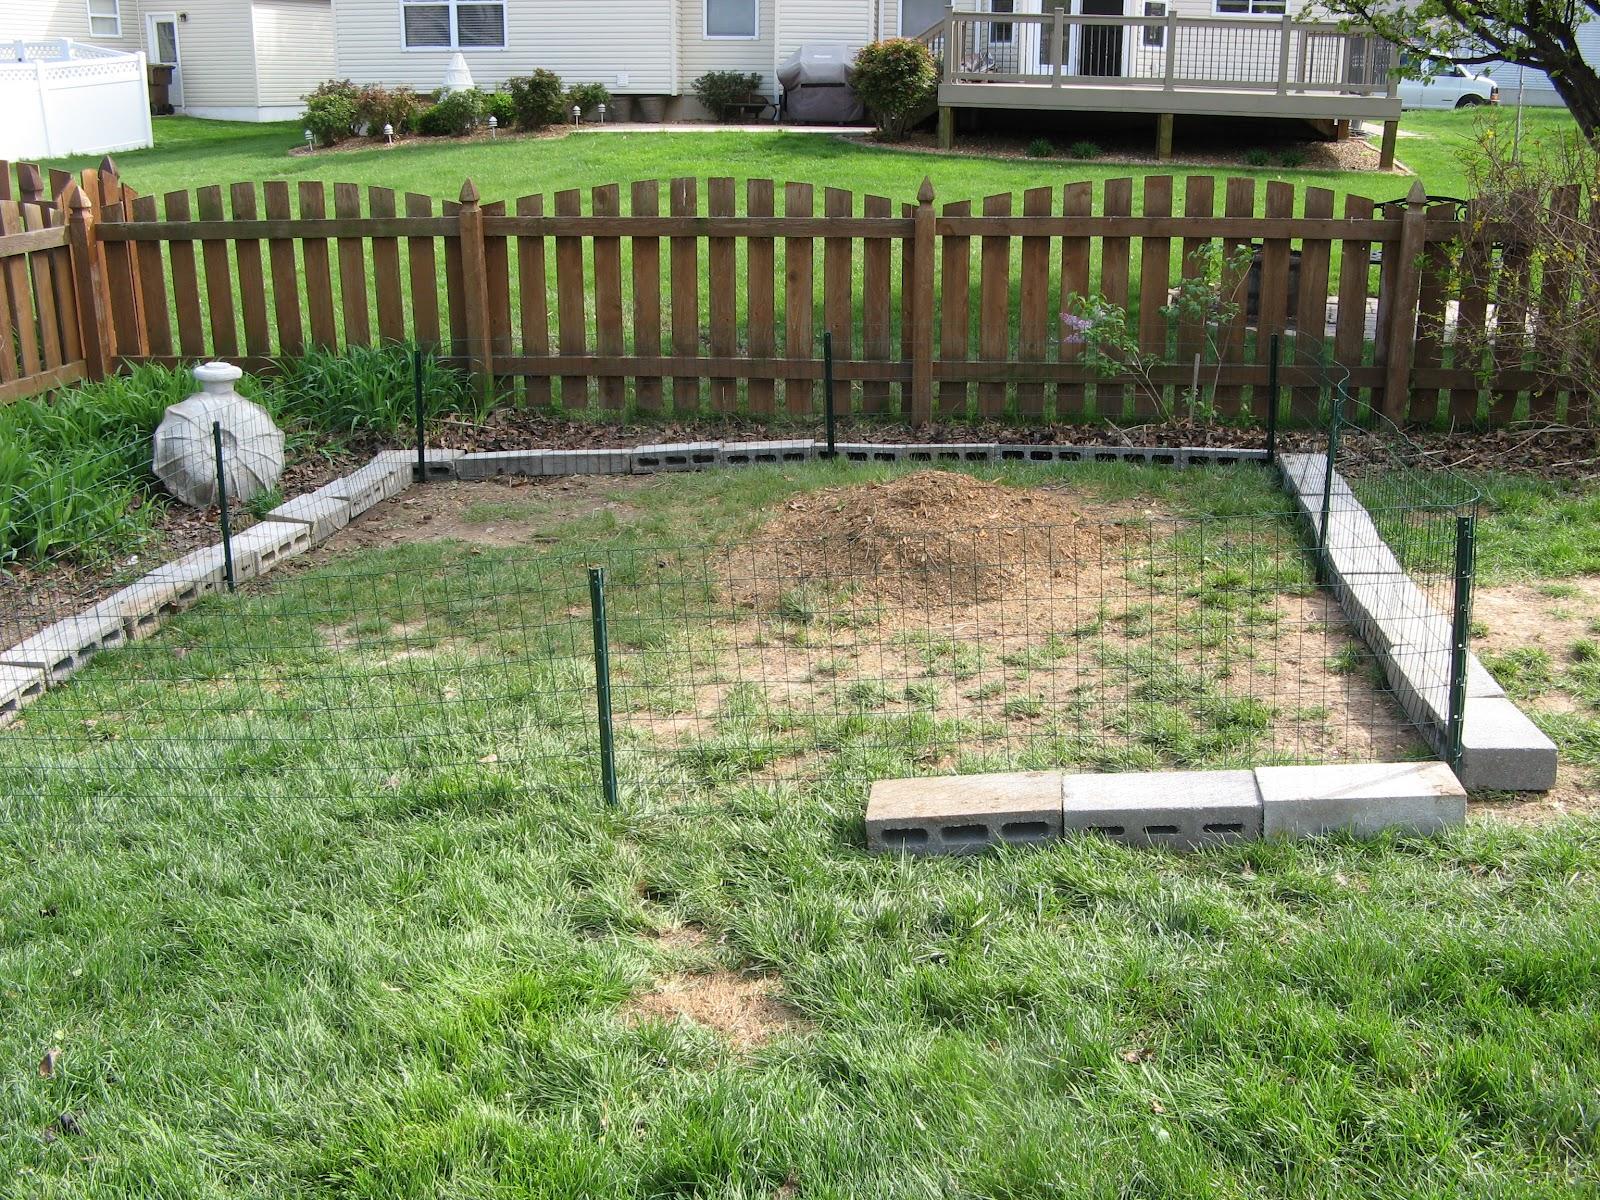 Vegetable Garden Fence Ideas Rabbits I Purchased Some Rabbit